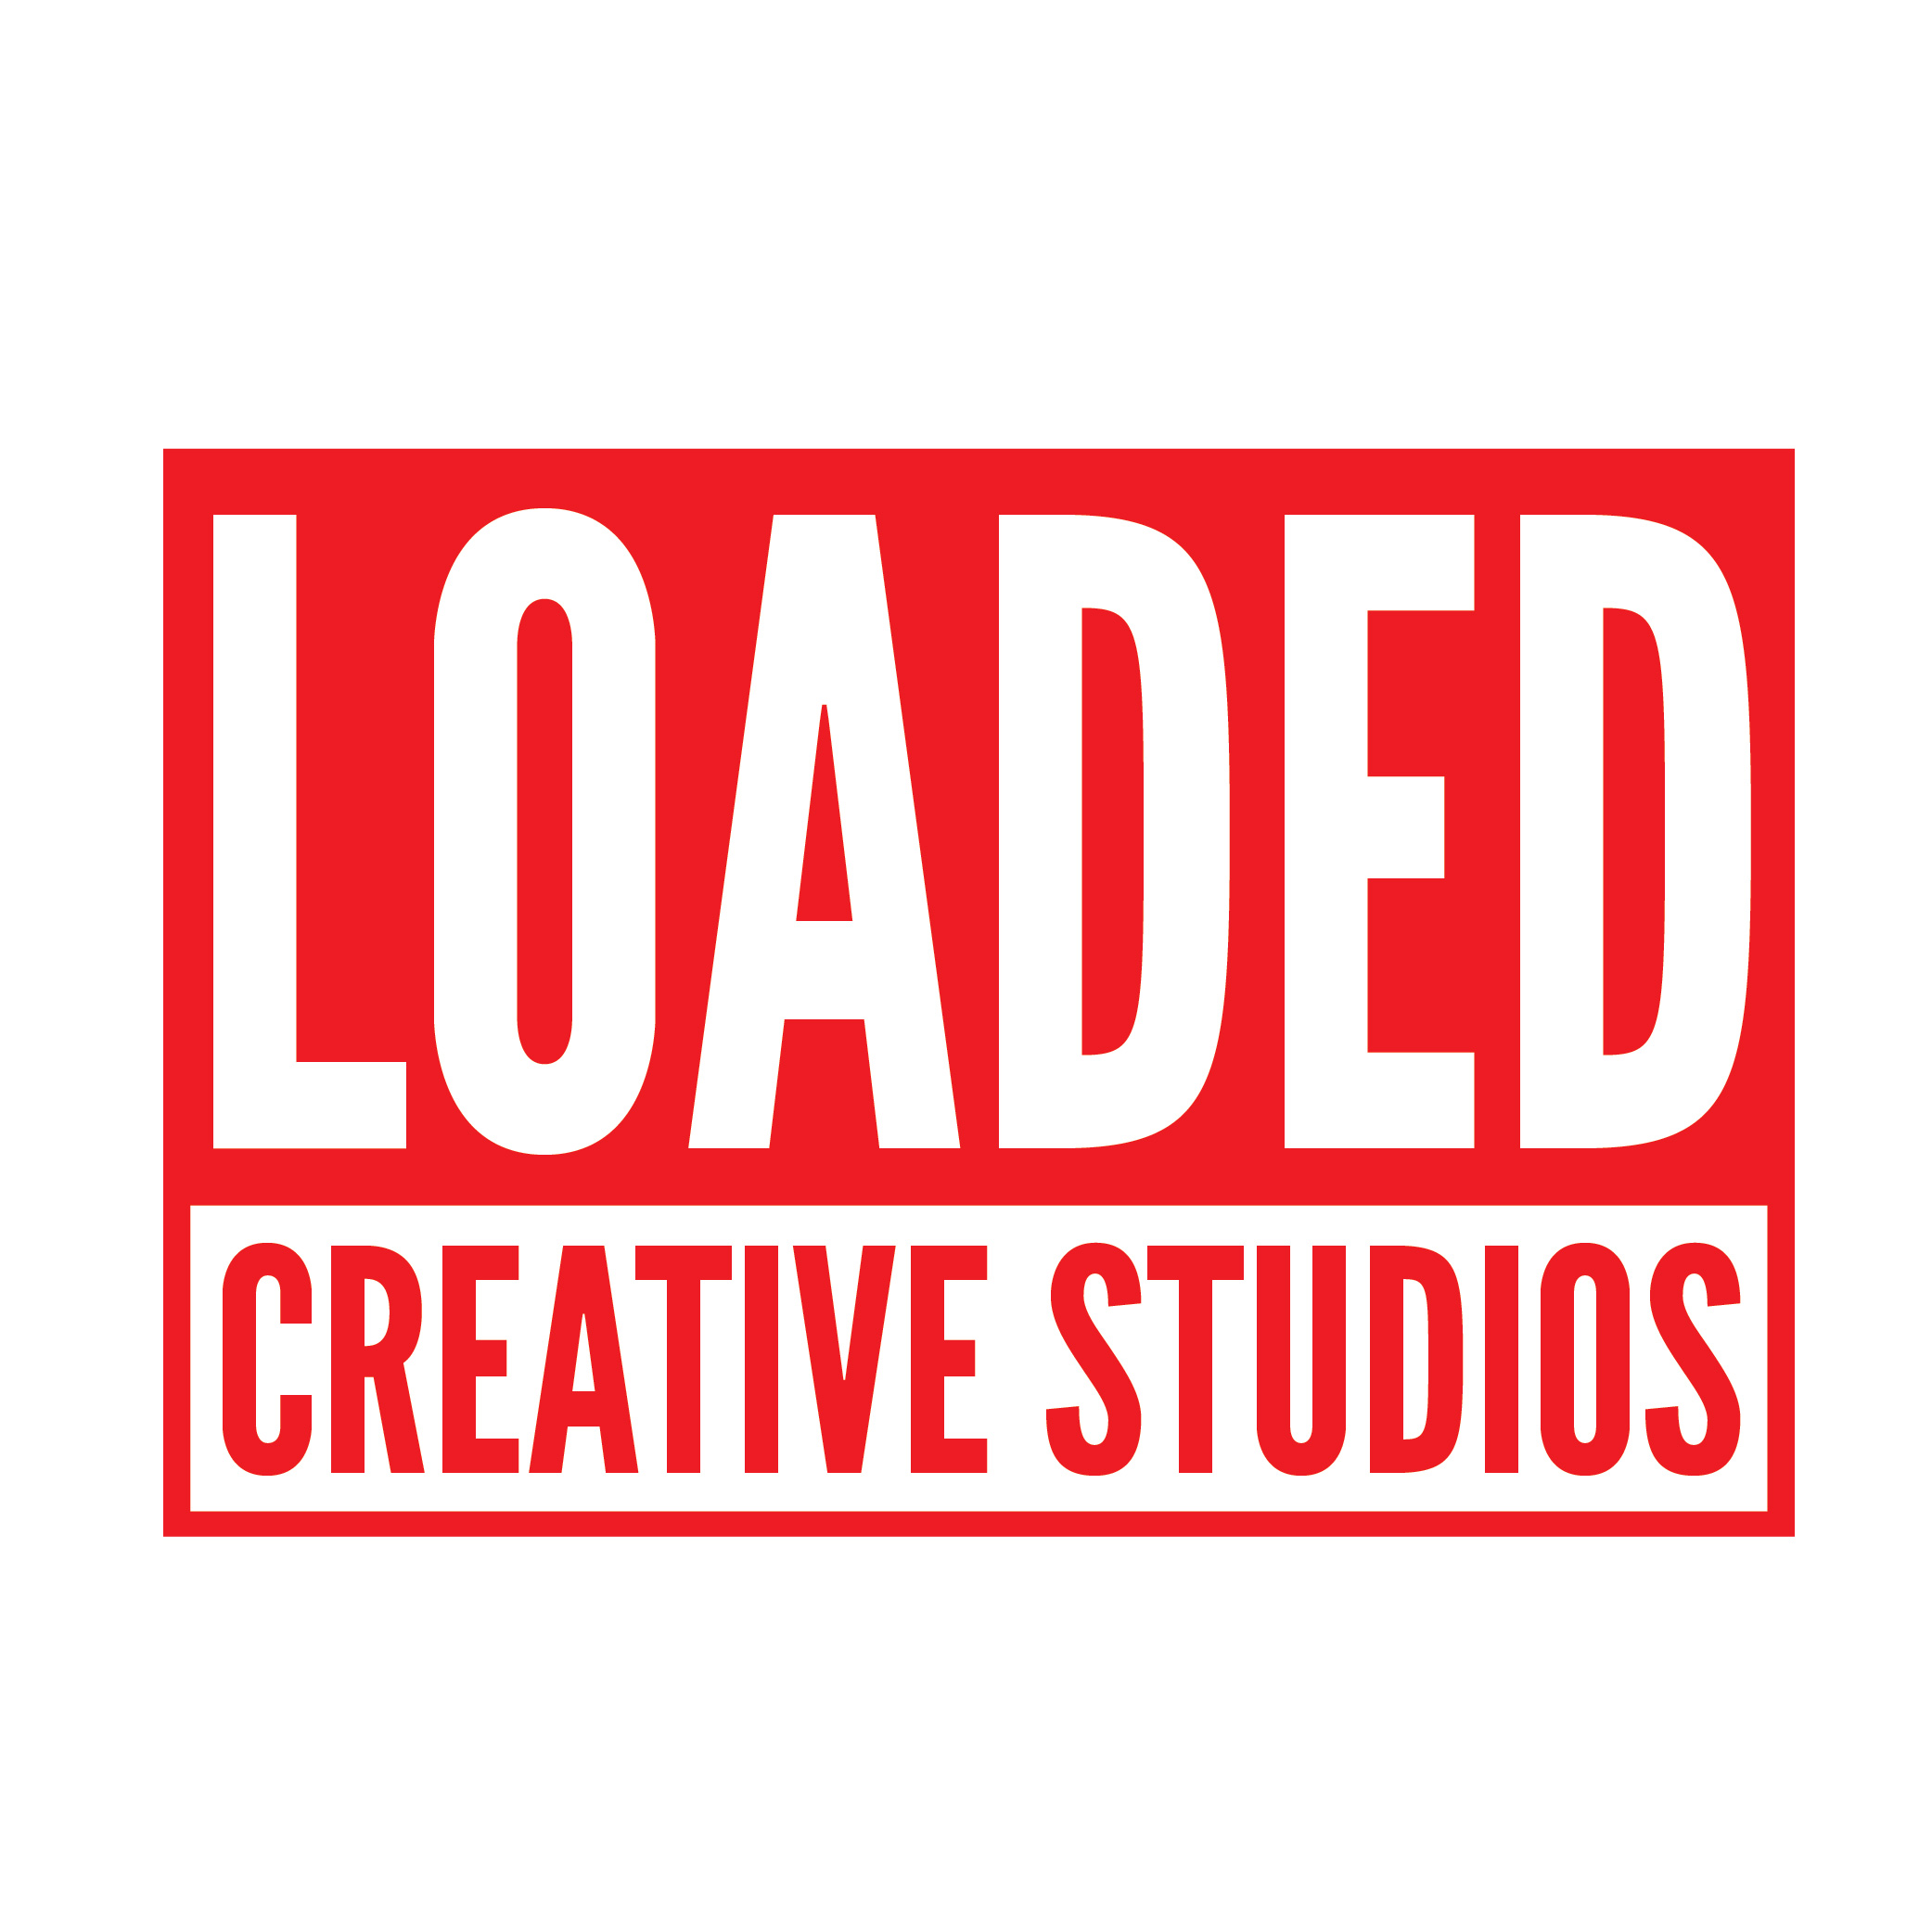 Loaded Studios